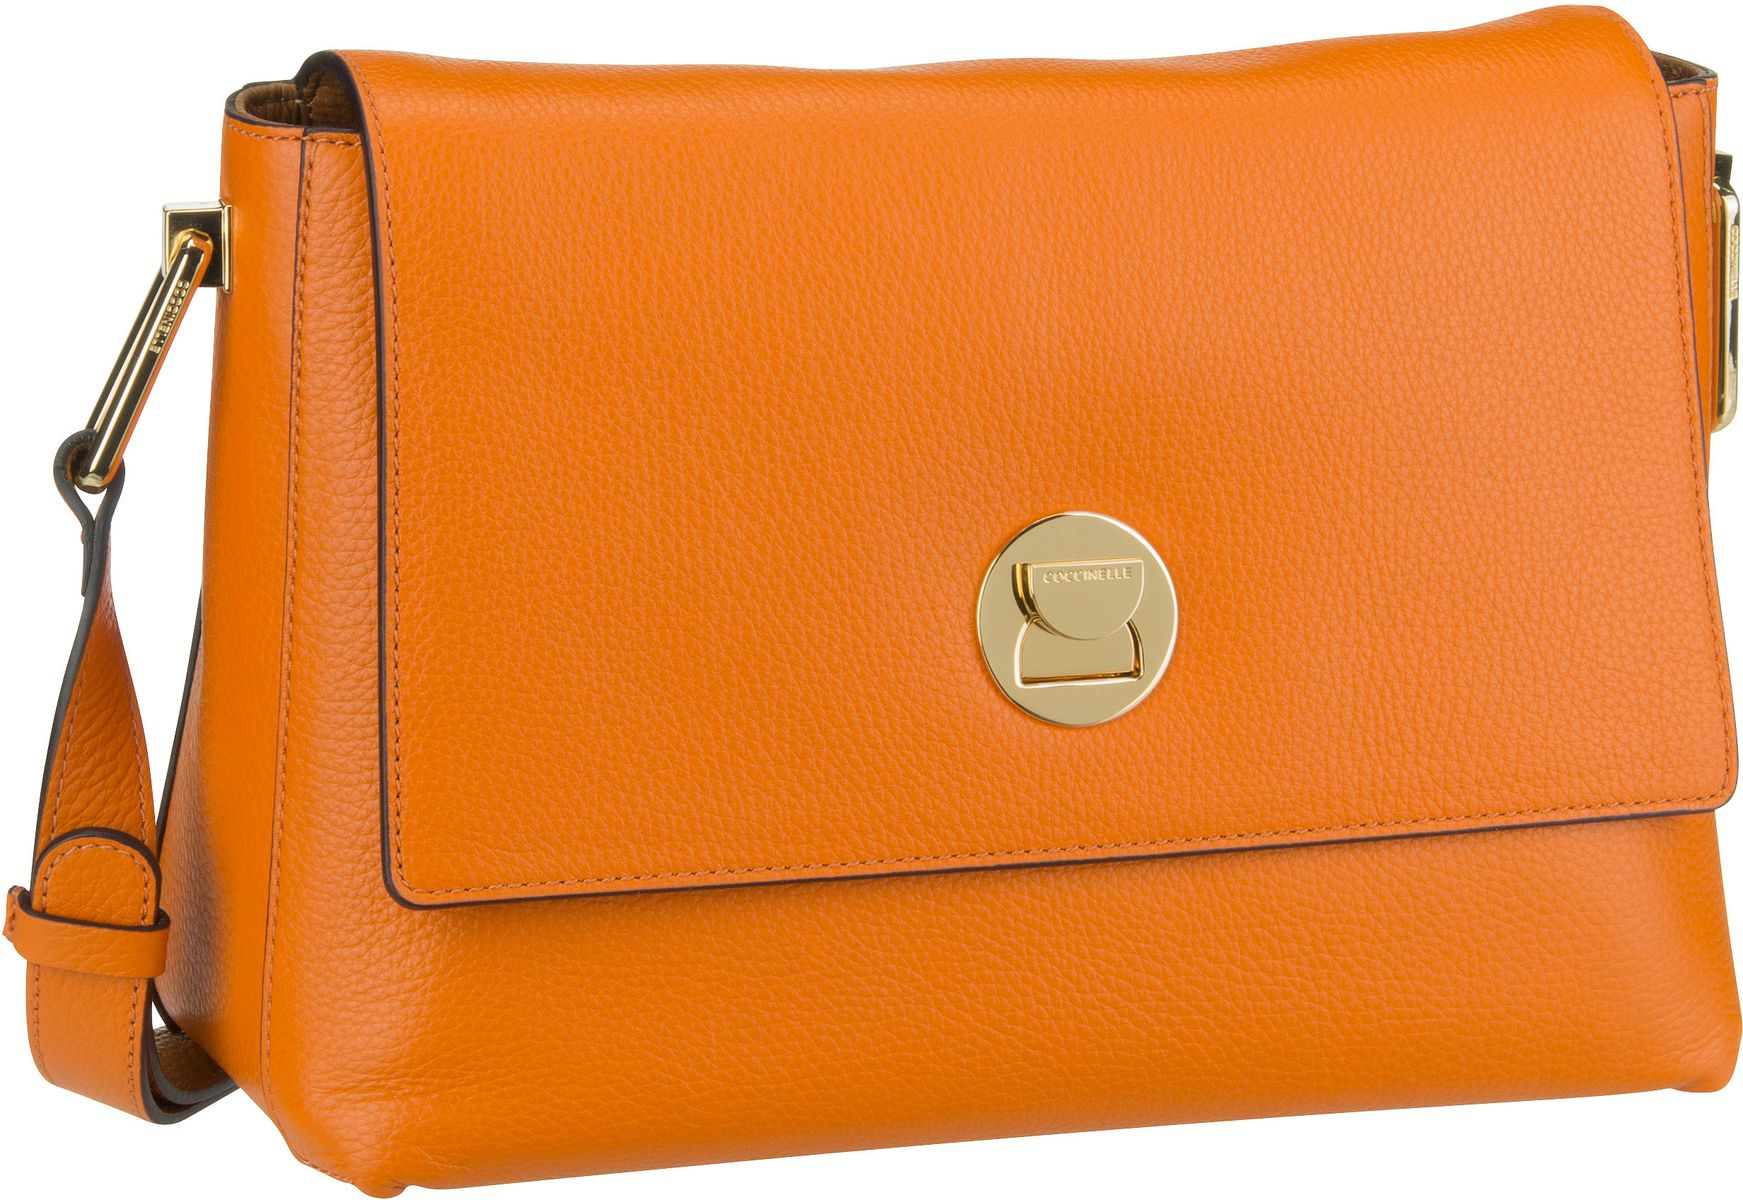 Handtasche Liya 1205 Ginger/Caramel